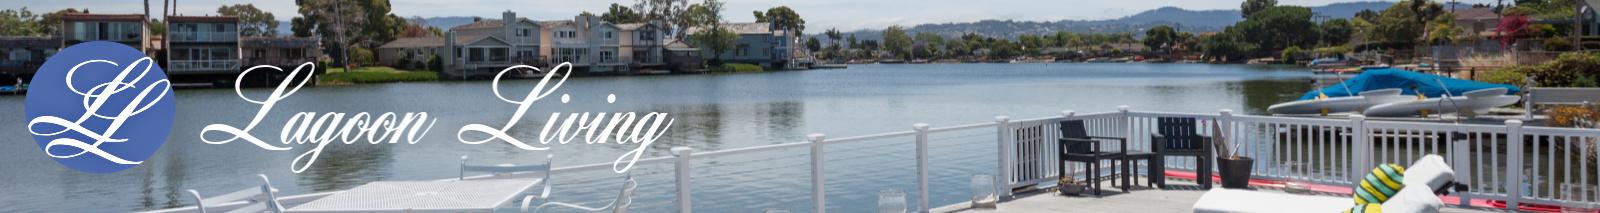 Community and Real Estate on the San Mateo Marina Lagoon